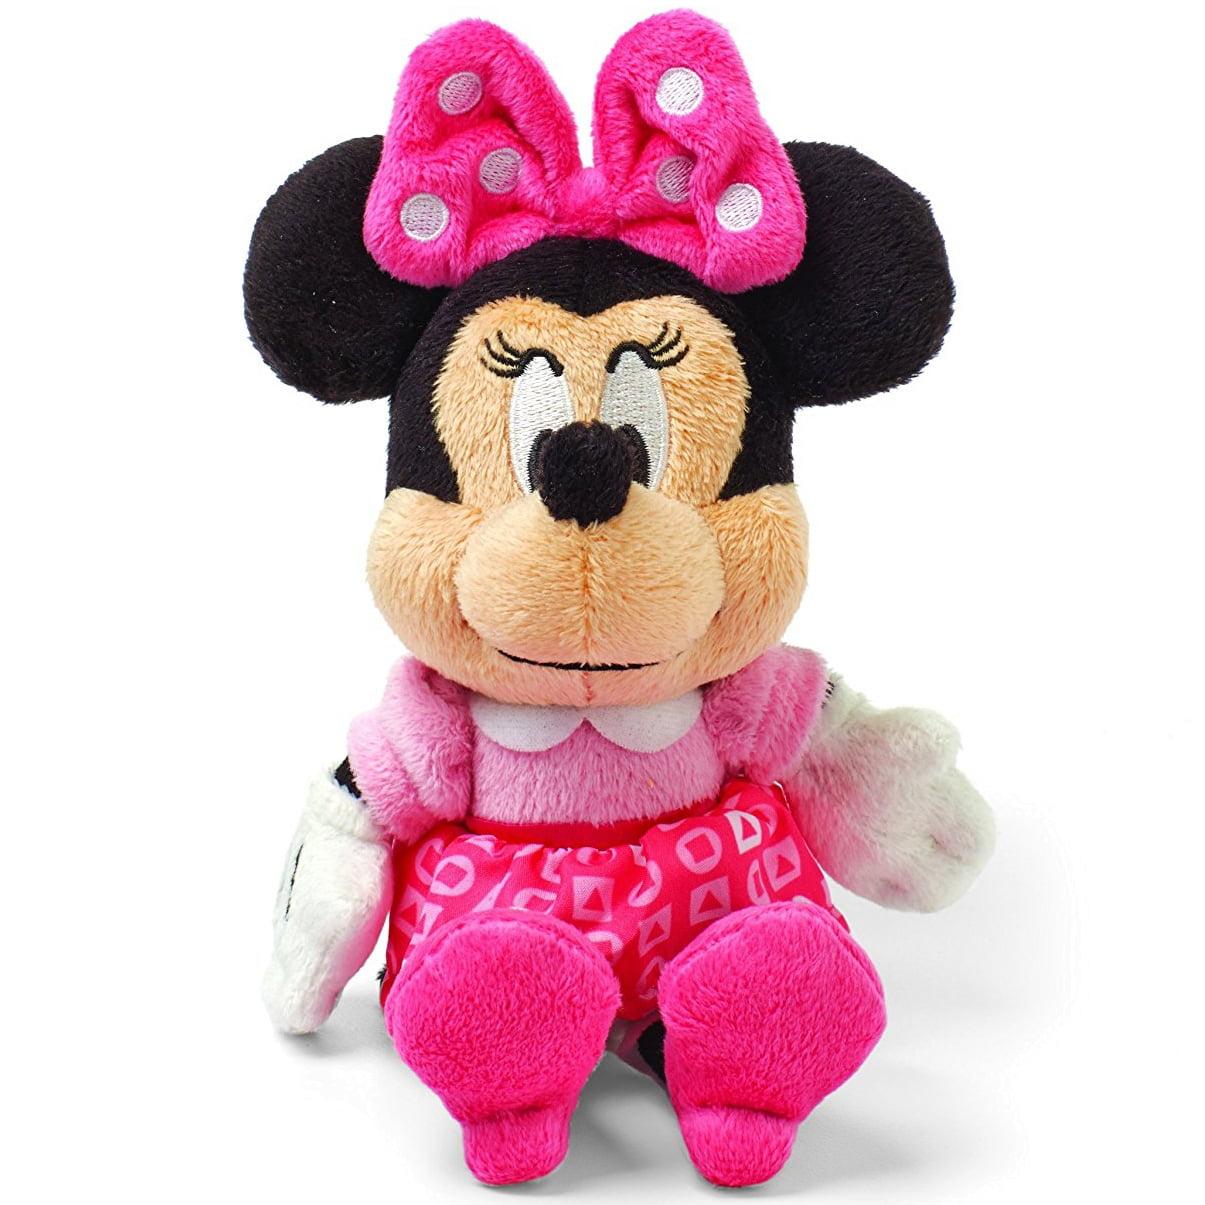 Disney Baby Mini Jinglers, Minnie Mouse